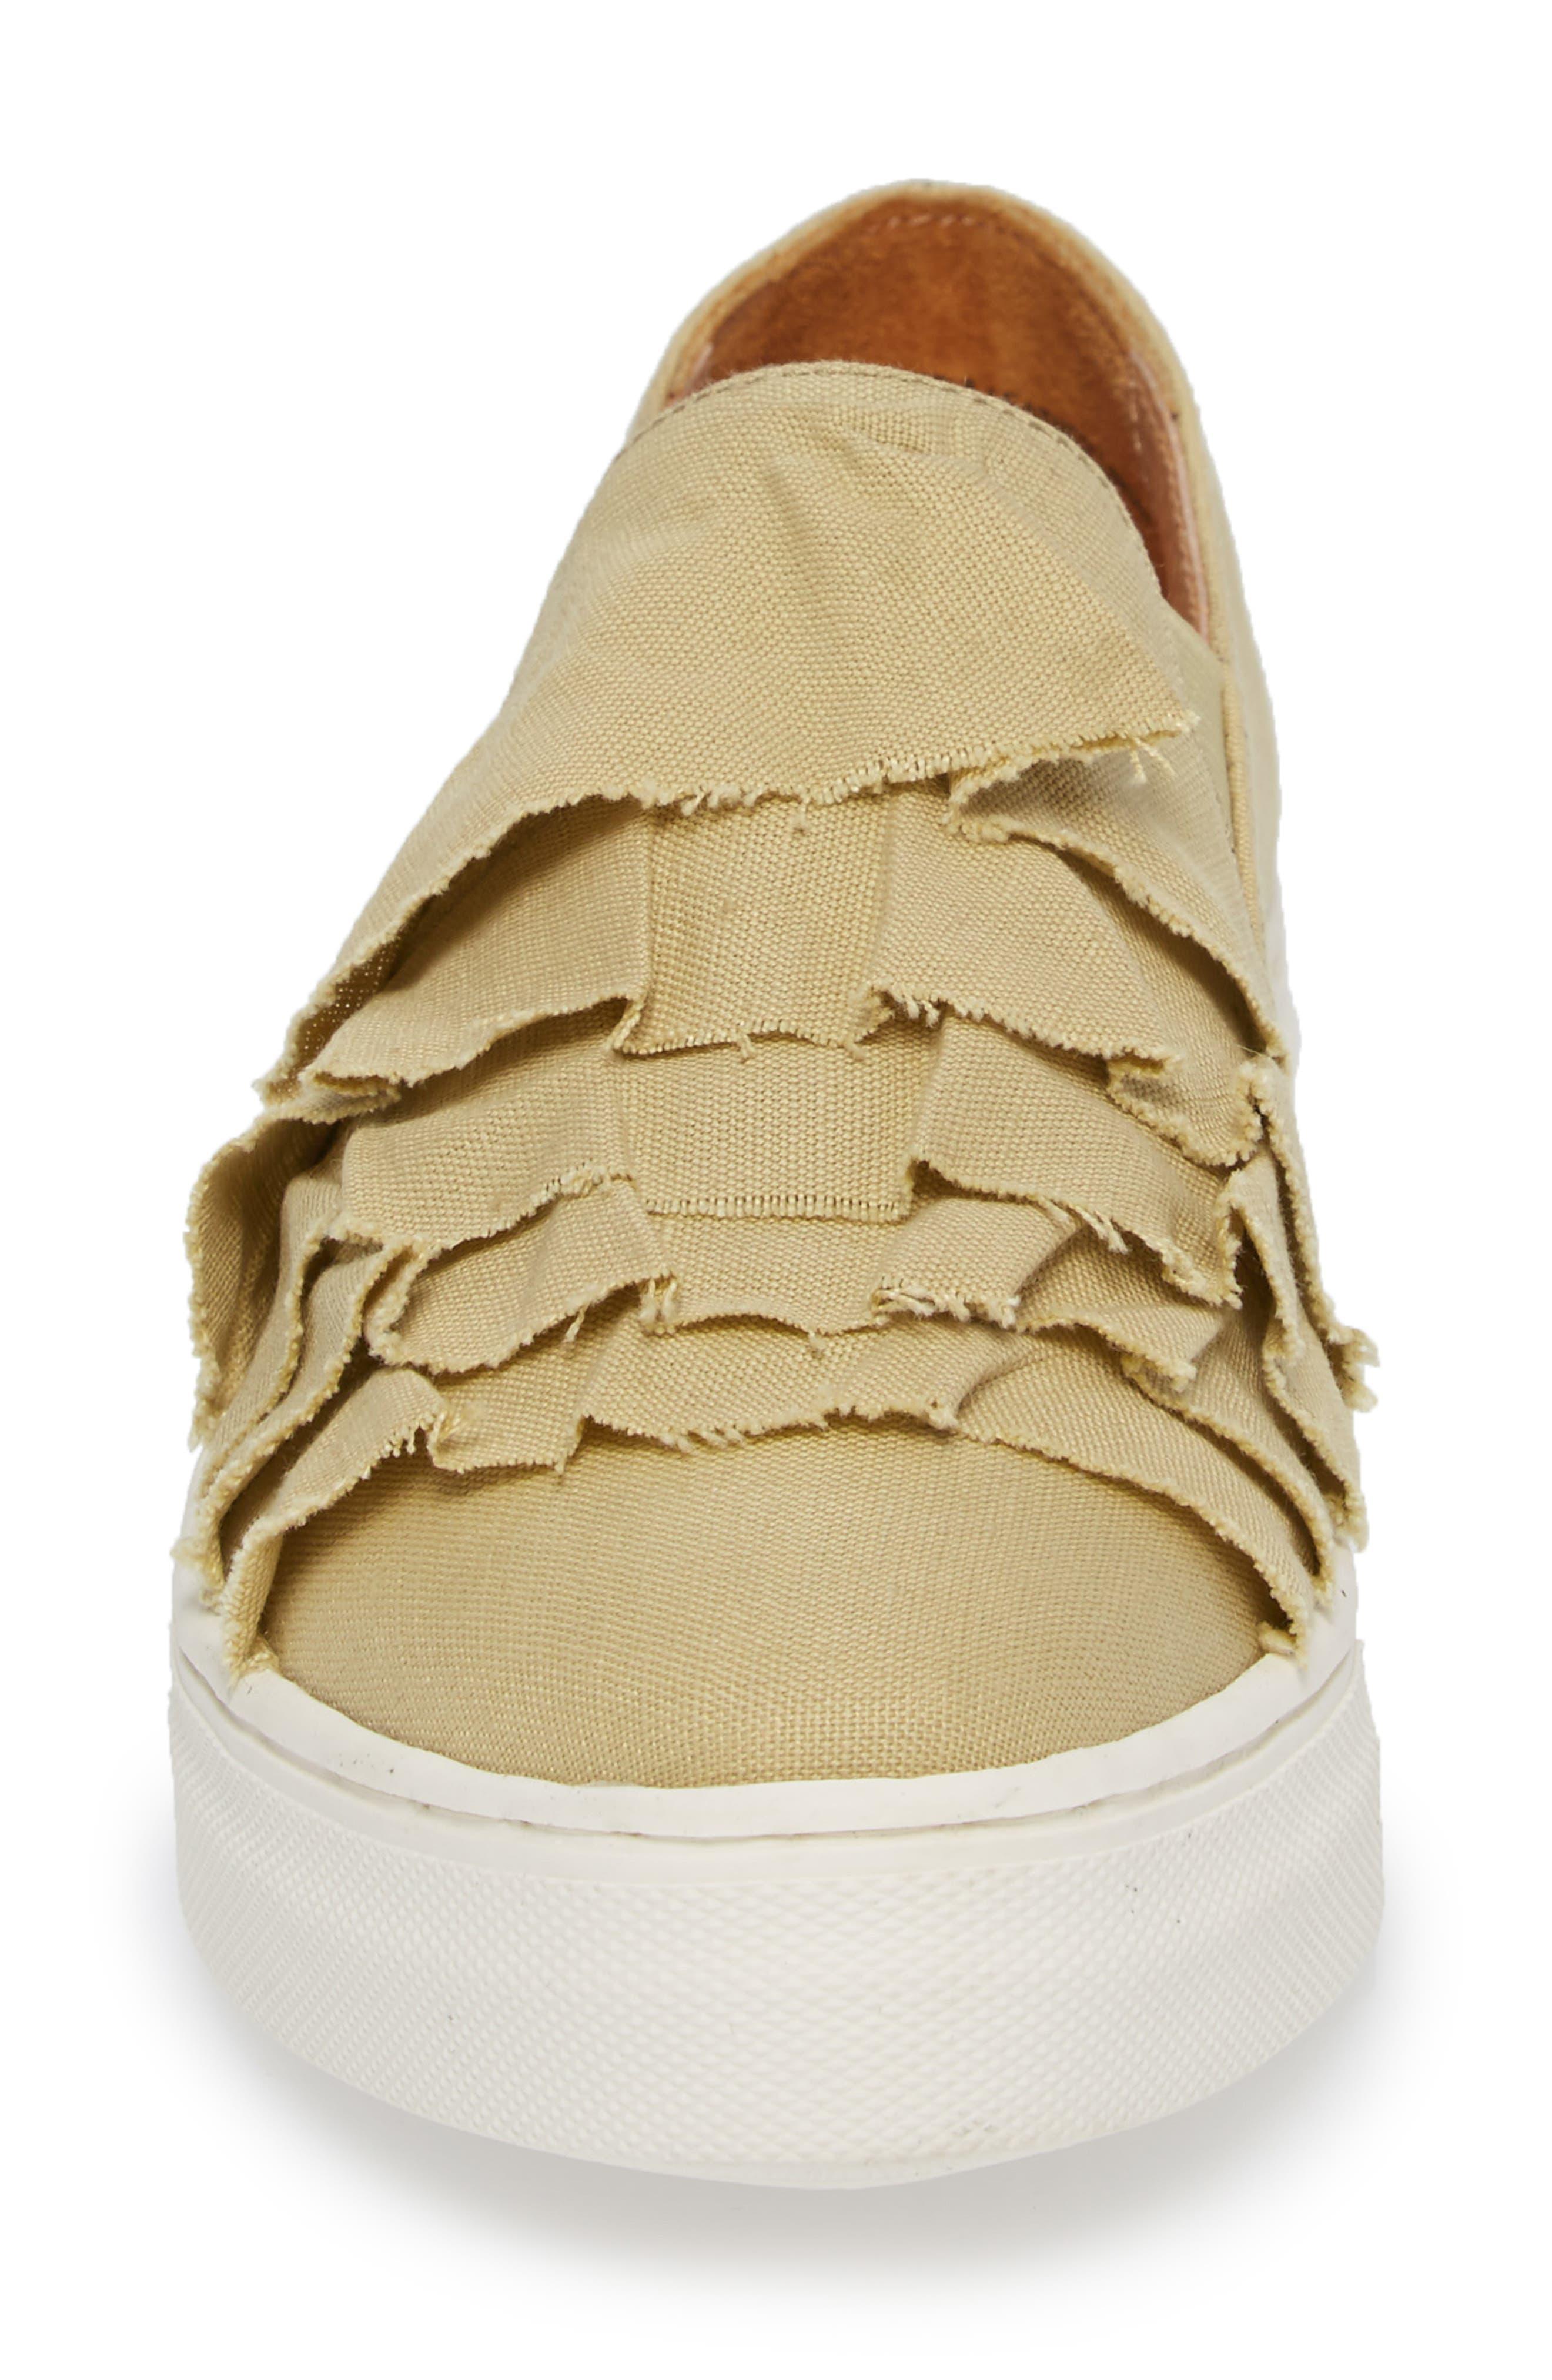 Quake II Slip-On Sneaker,                             Alternate thumbnail 4, color,                             Natural Frayed Fabric